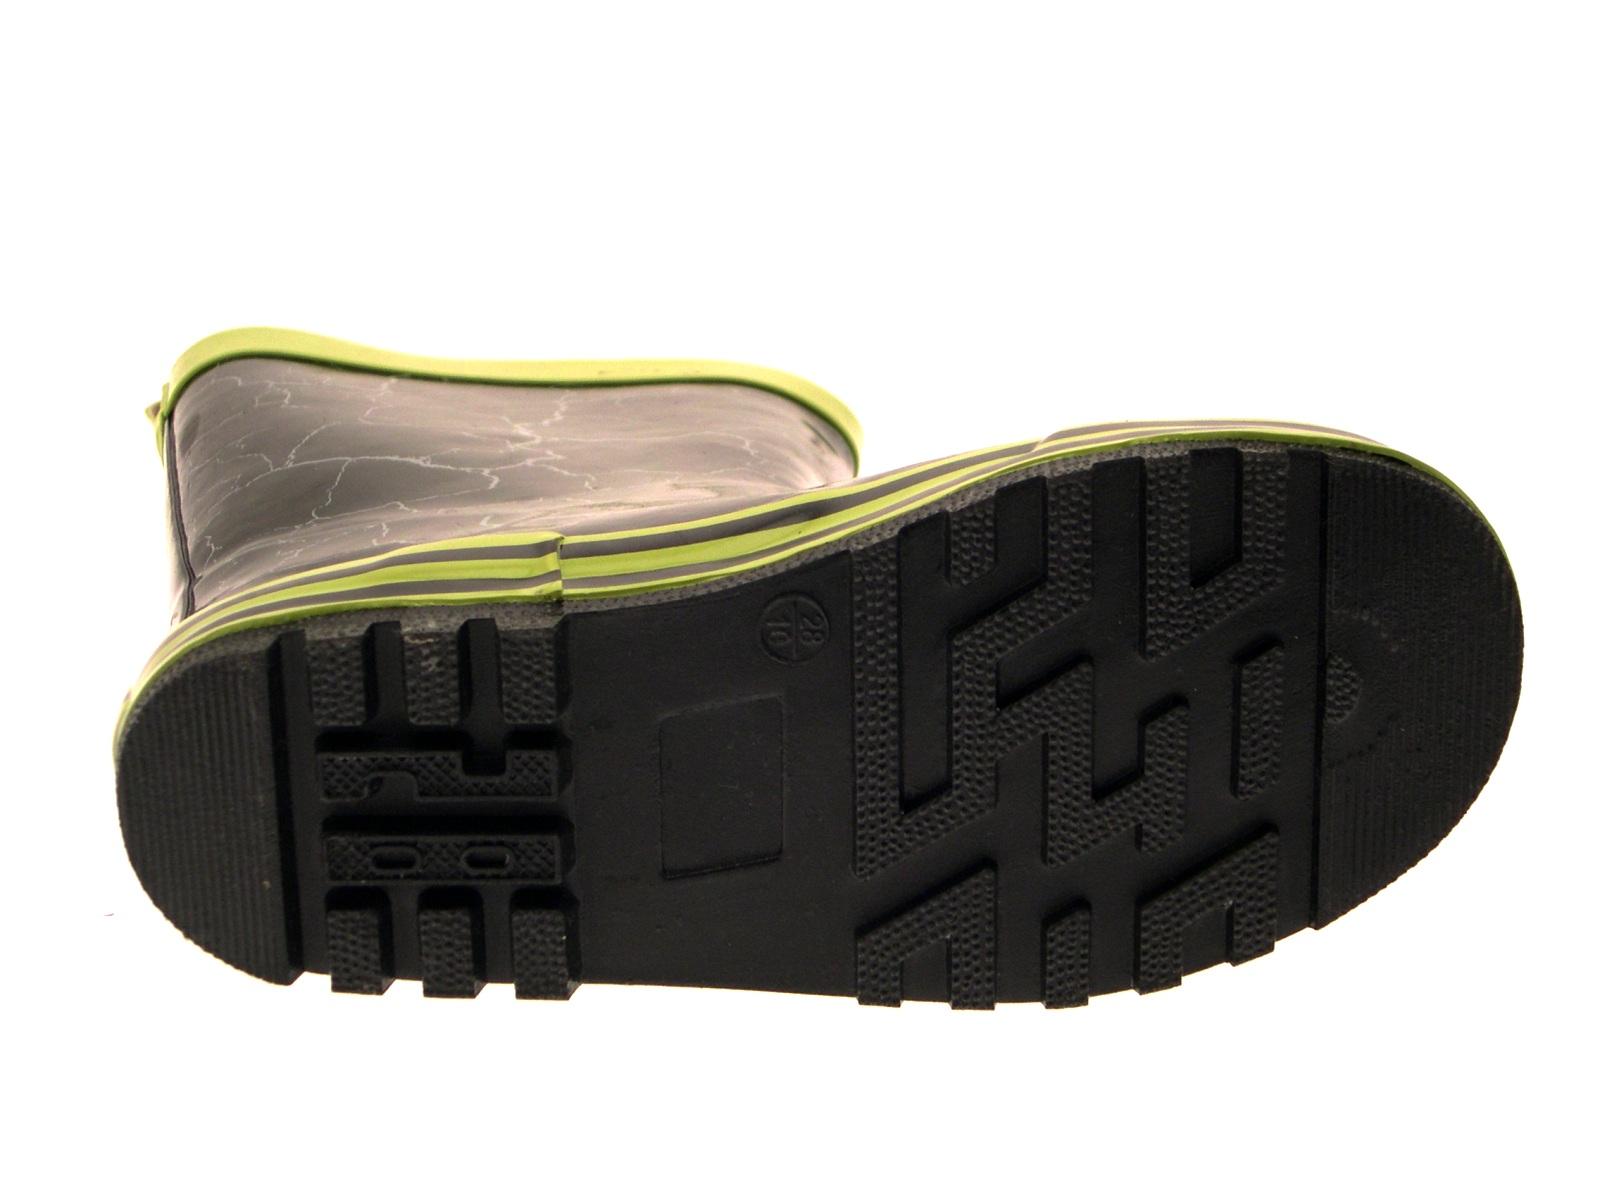 Boys Teenage Mutant Ninja Turtles Rubber Snow Boots Wellies Wellingtons Size 7-3